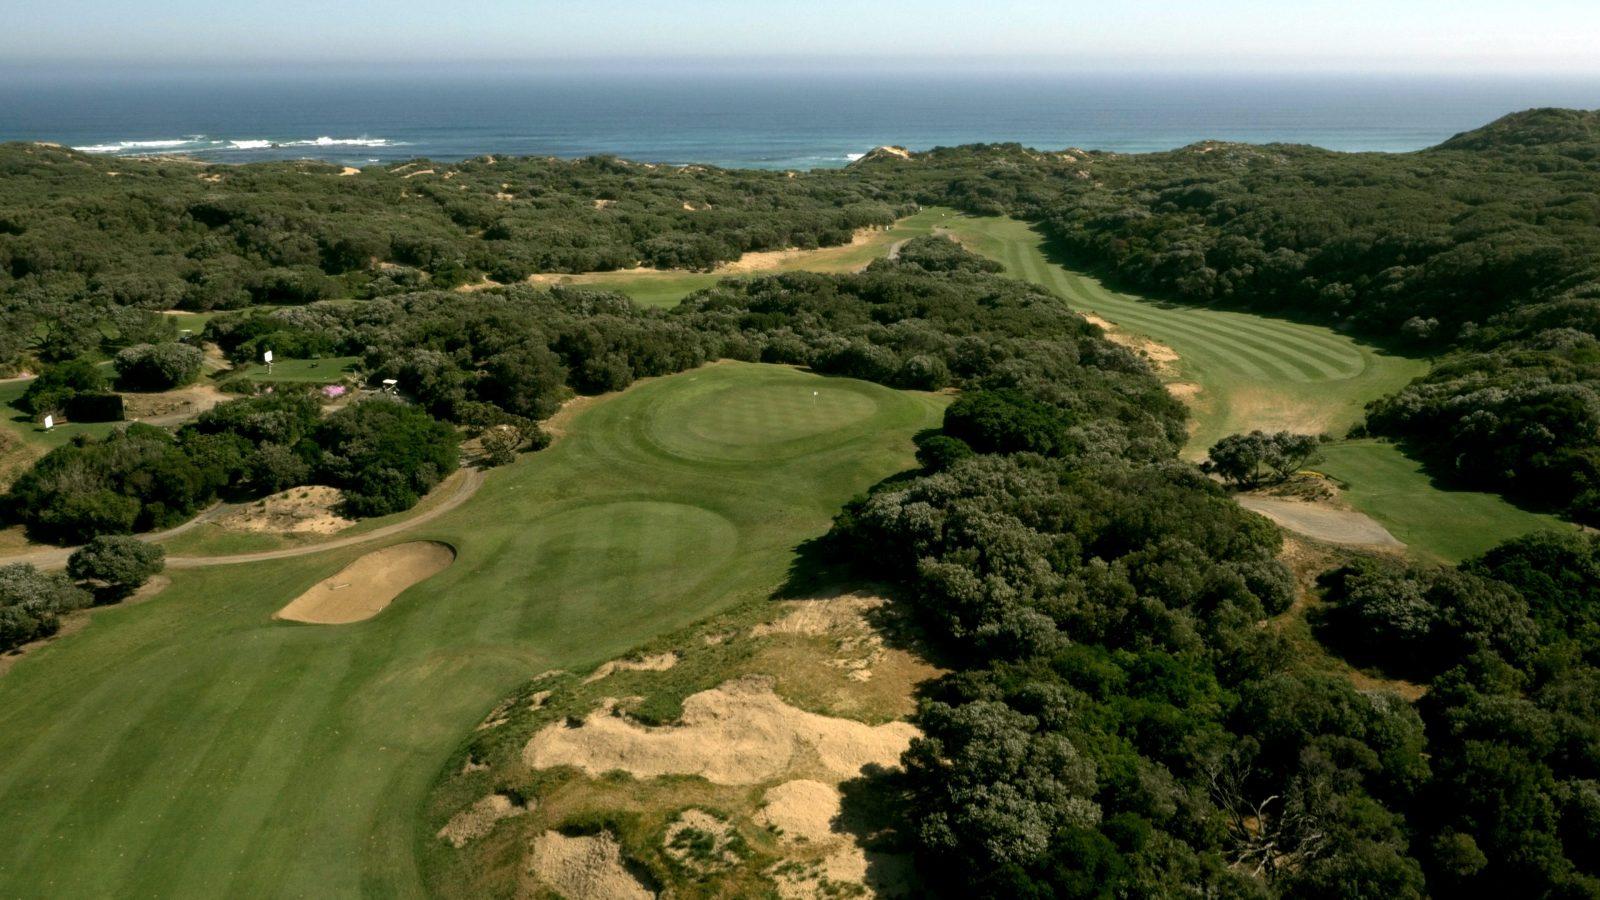 Warrnambool Golf Club from the Shipwreck bend